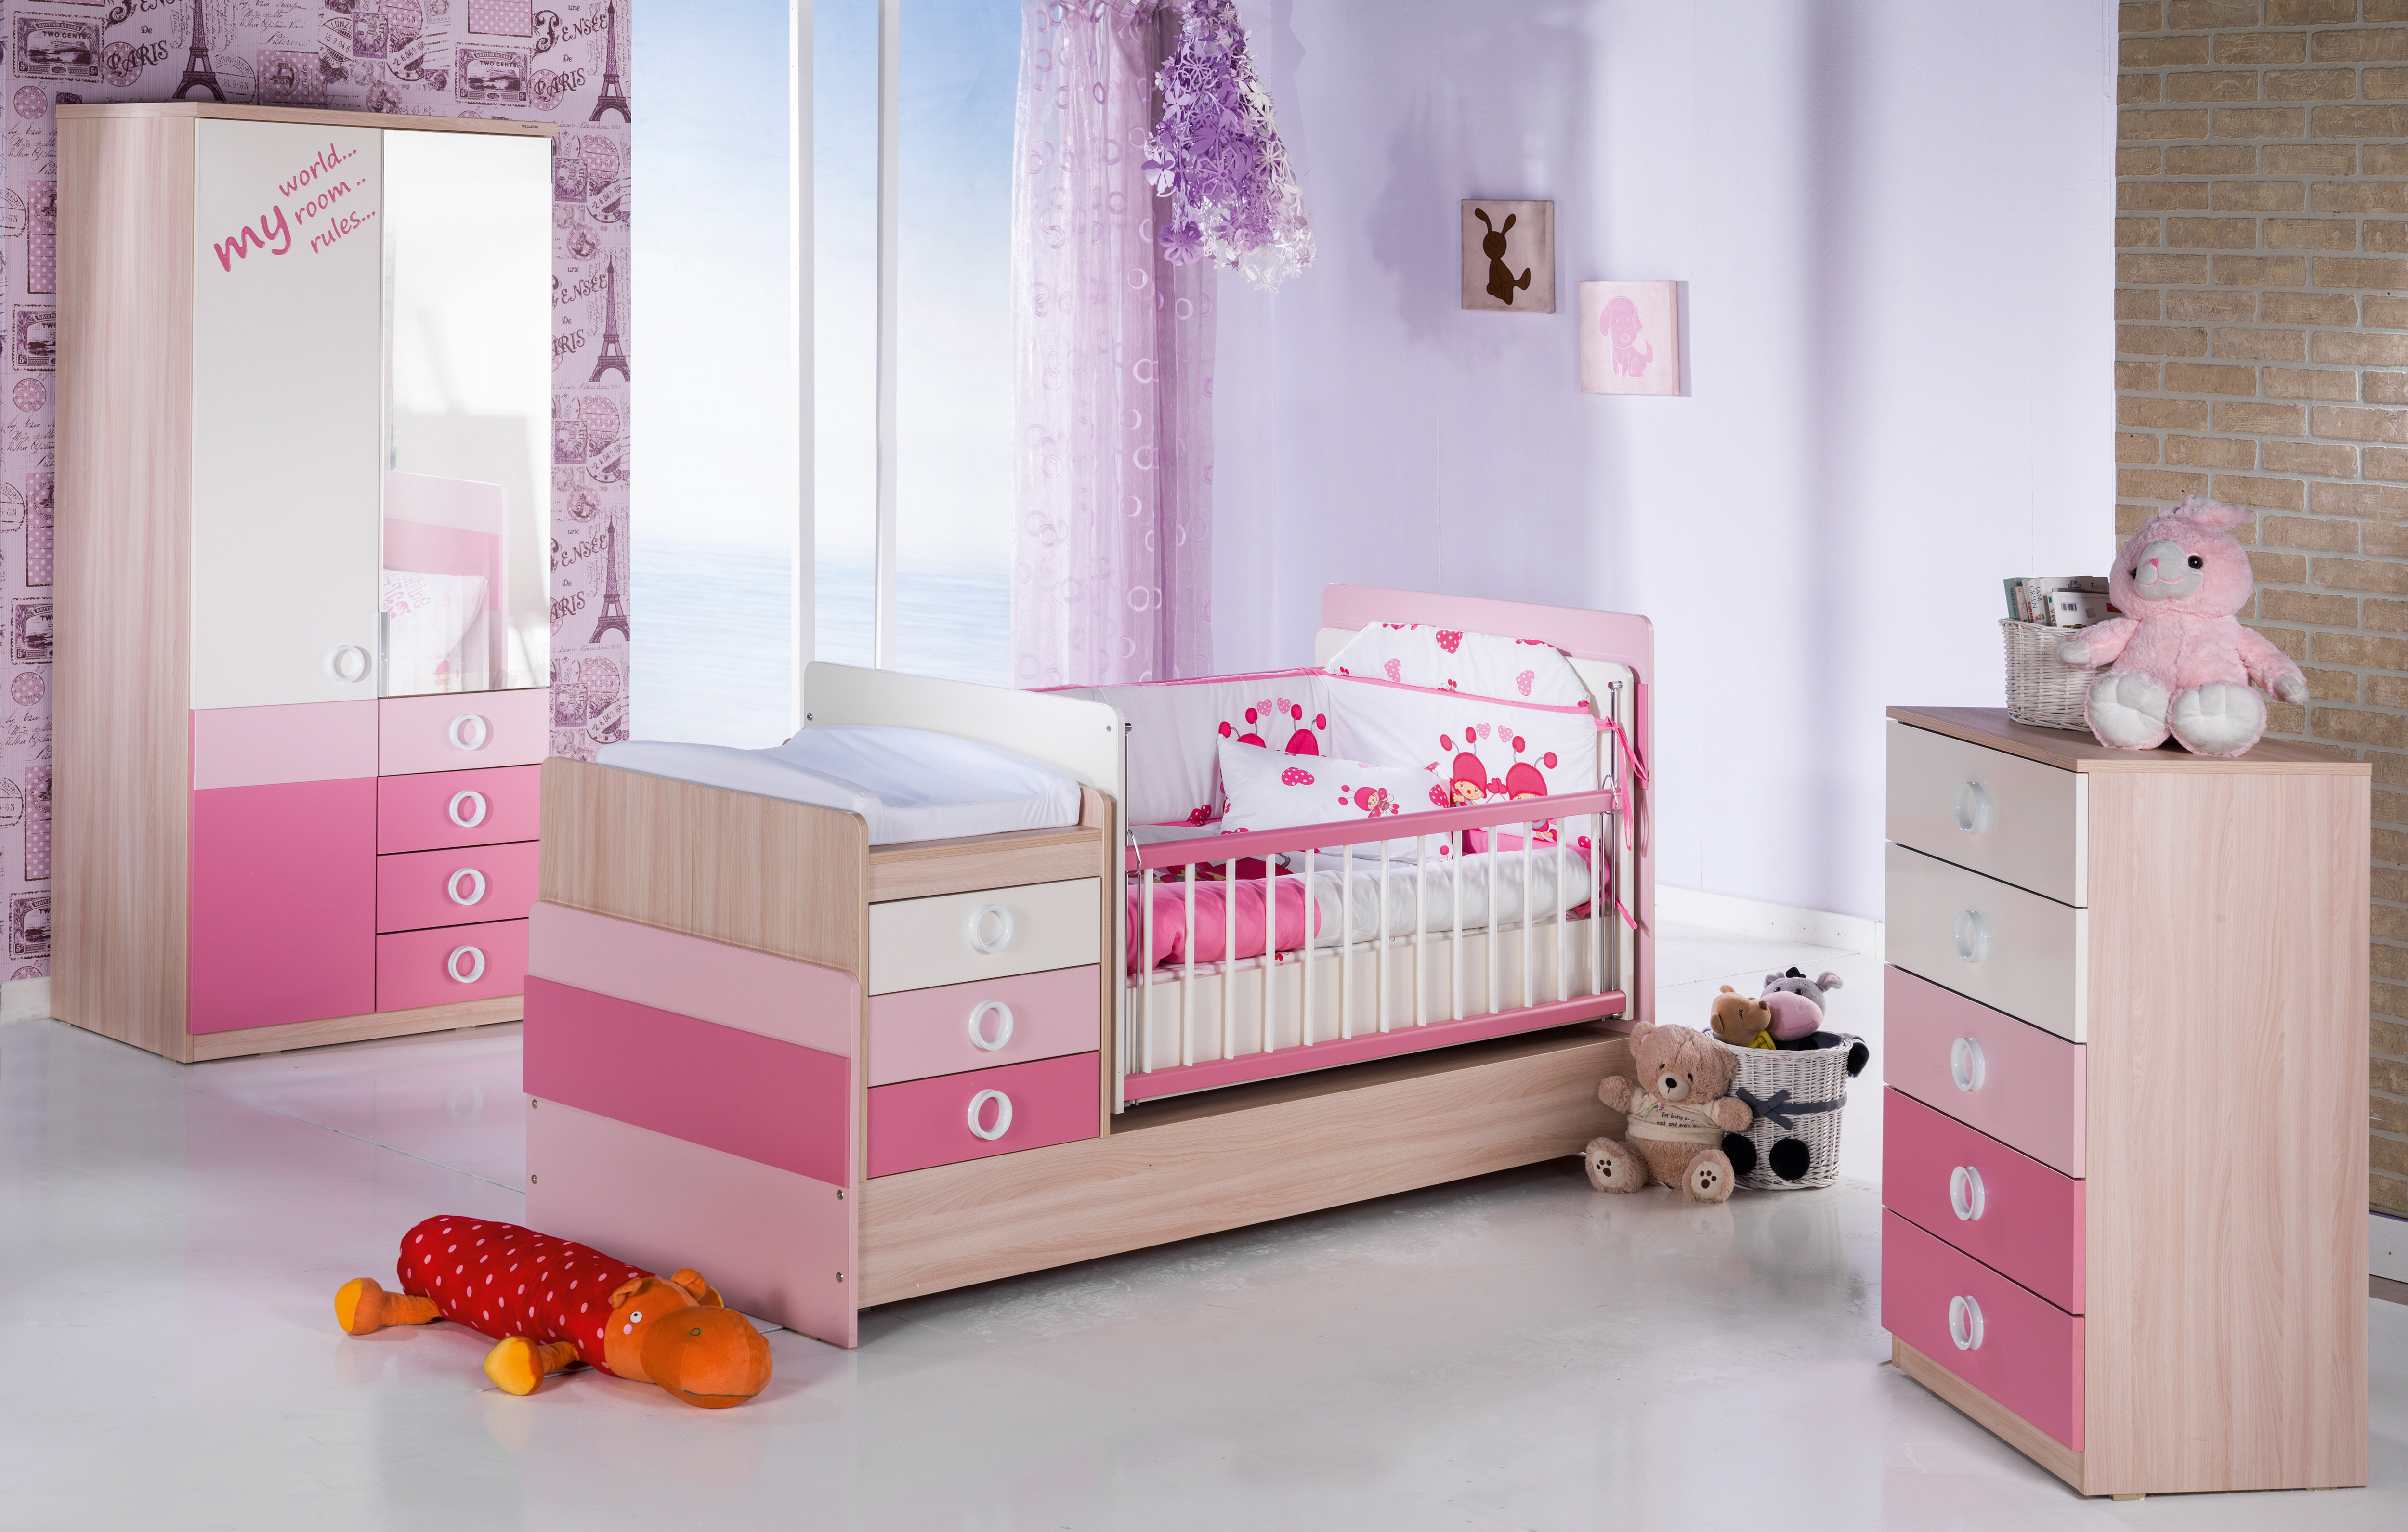 Portivo chambre enfant-